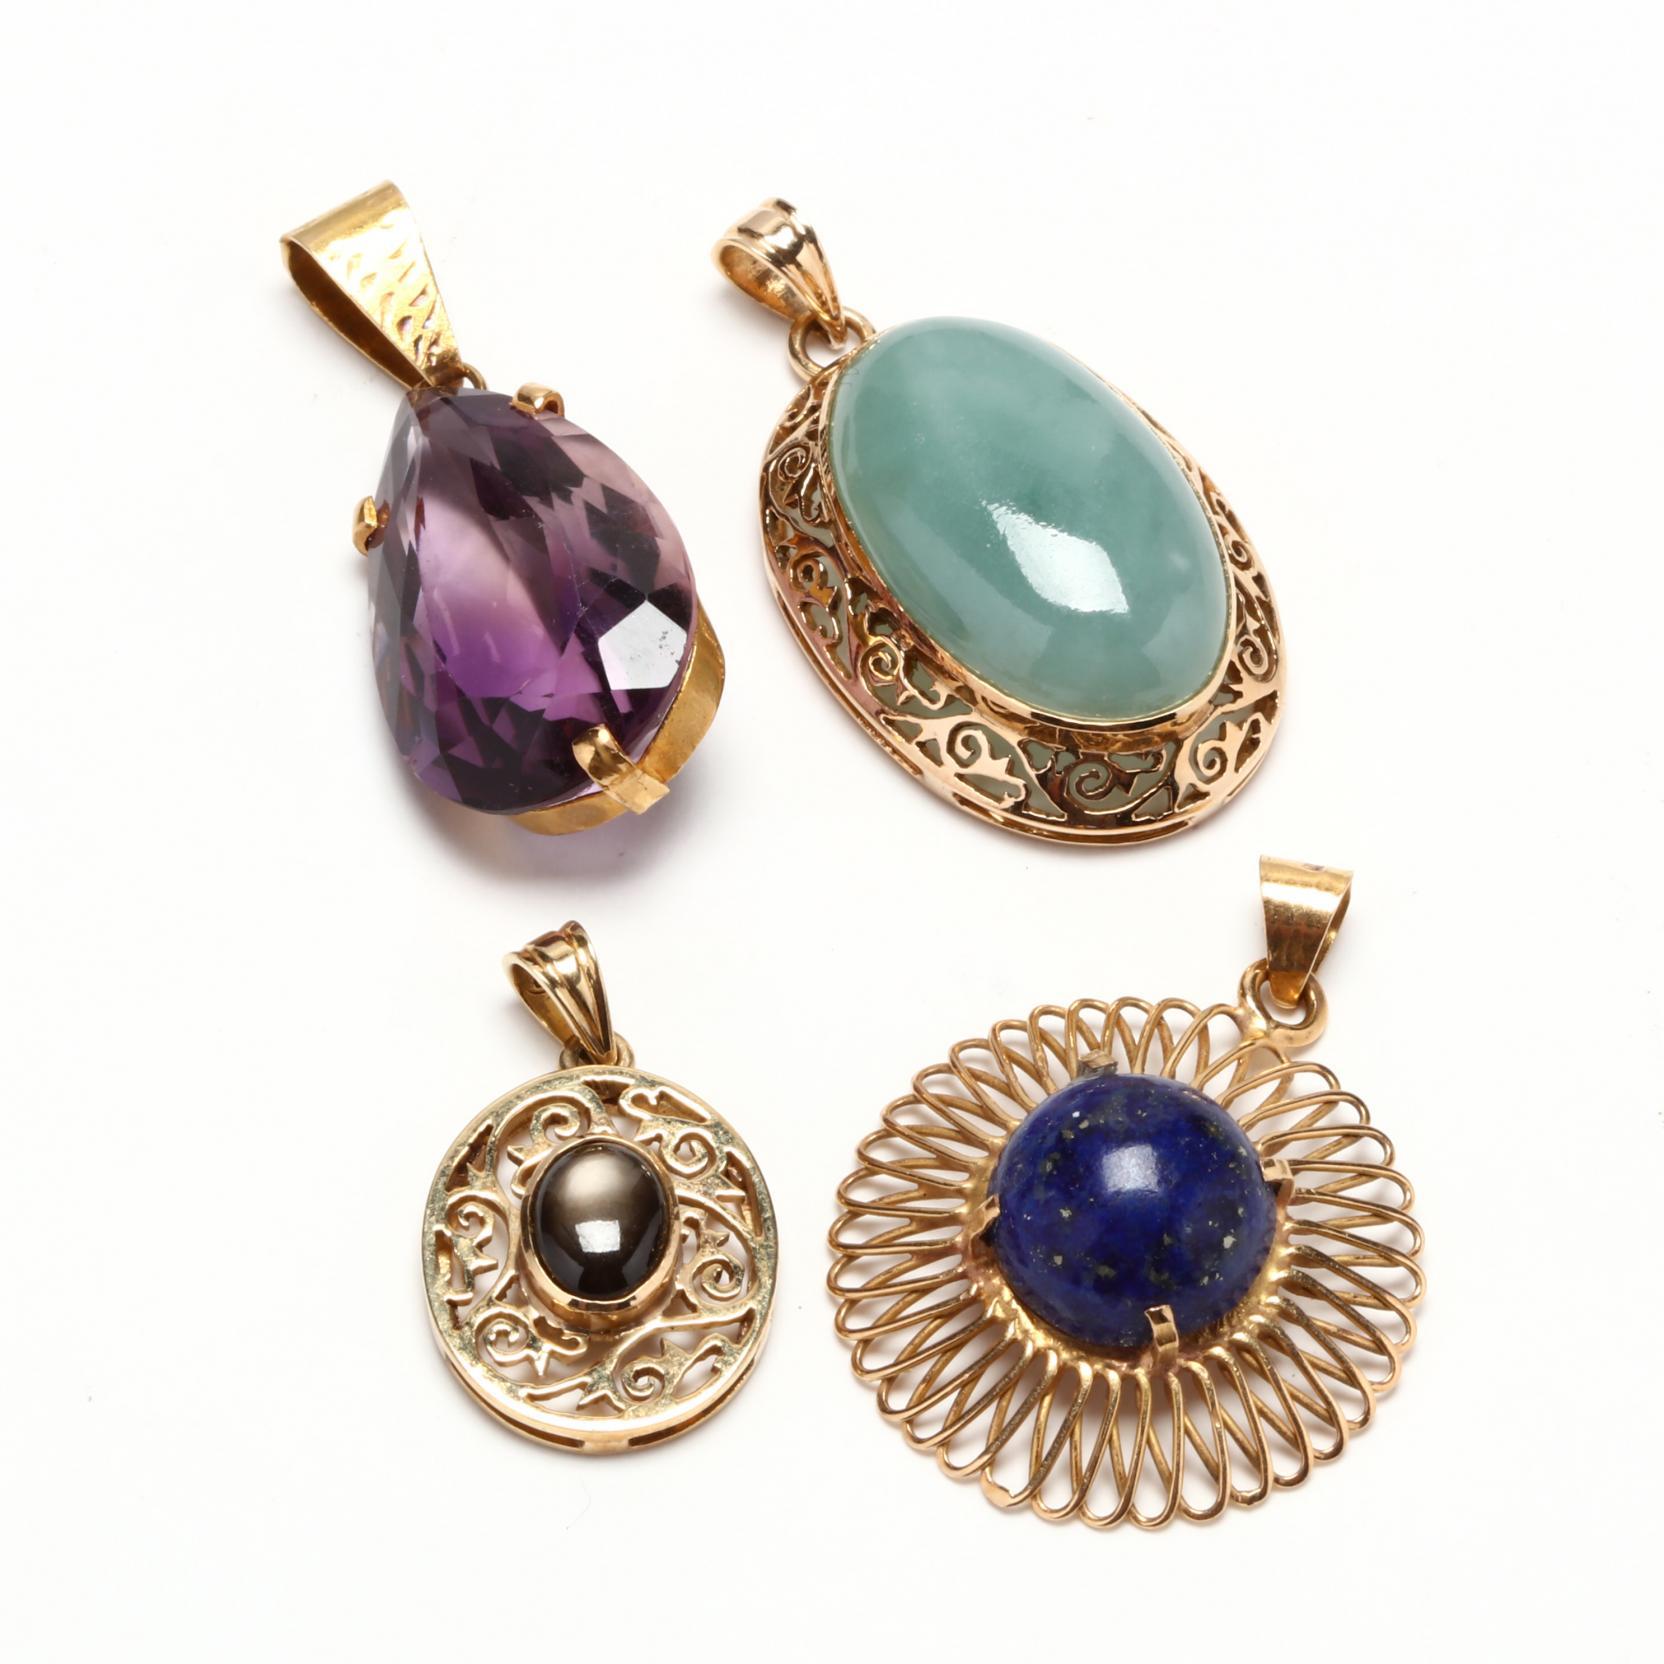 four-gold-and-gem-set-pendants